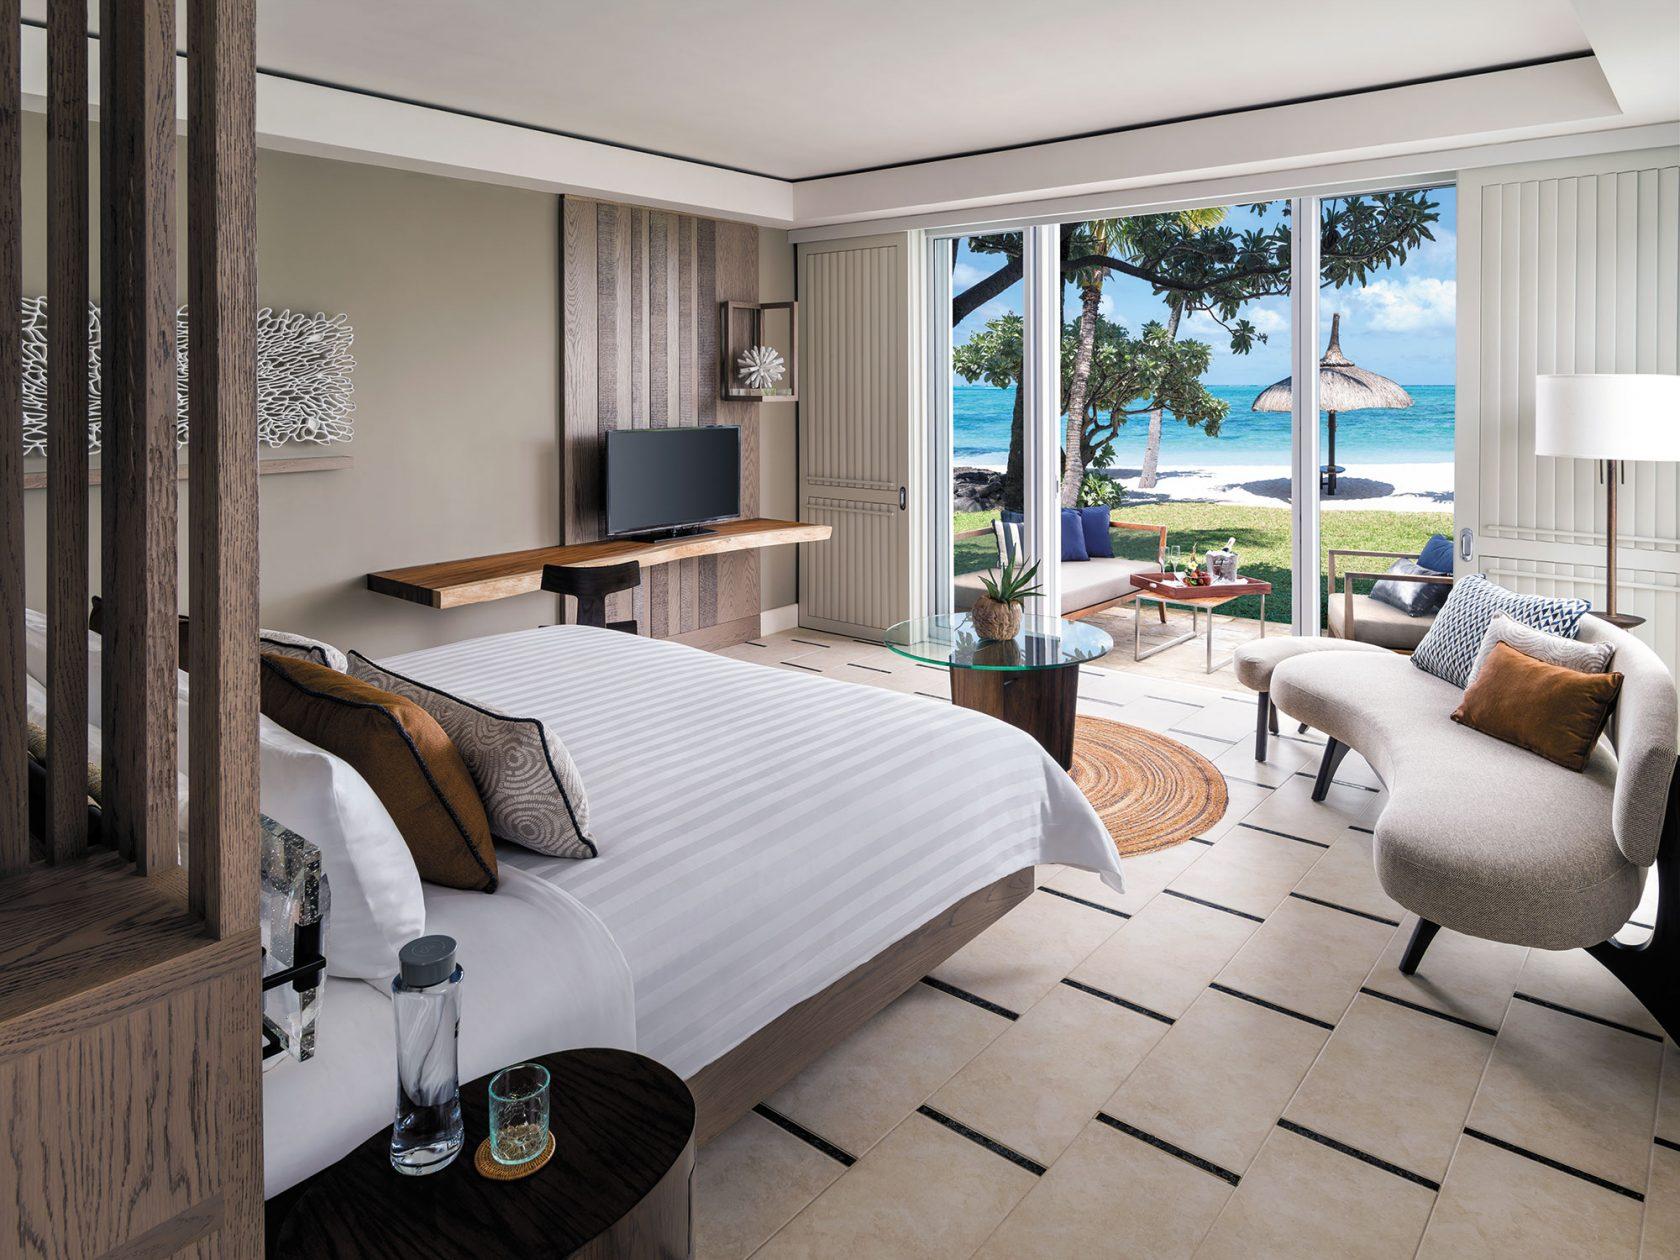 Shangri-La Touessrok Zimmer mit Strandzugang